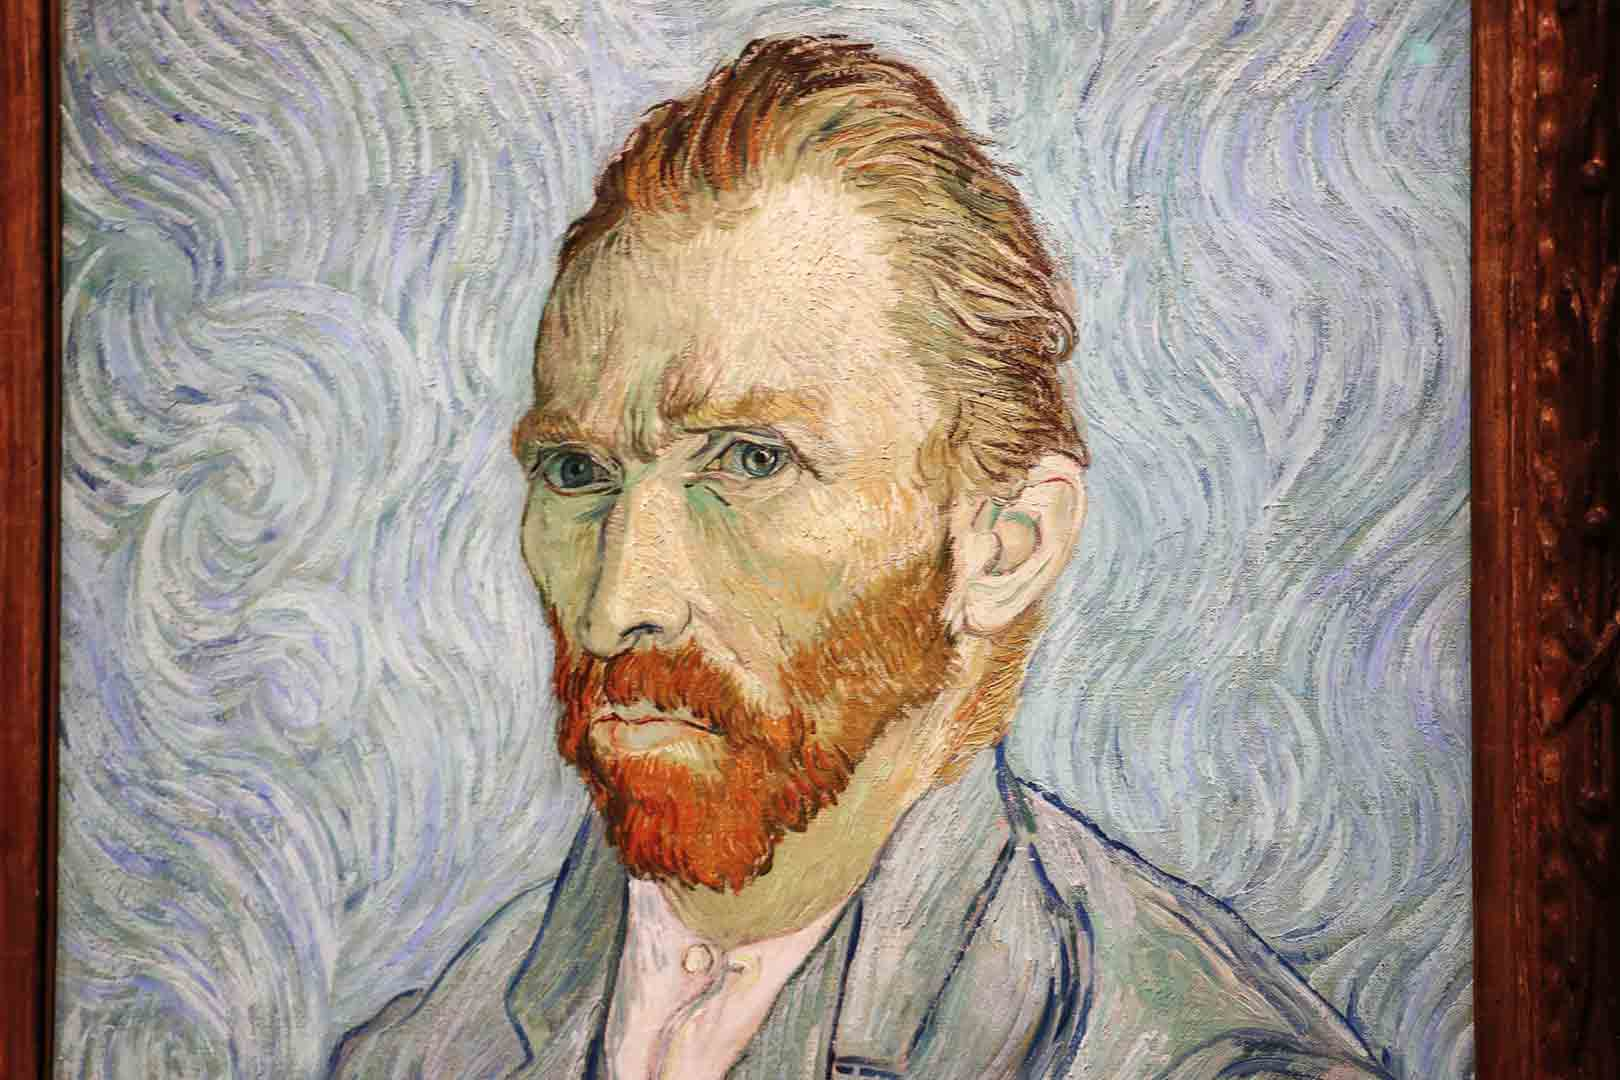 Van Gogh S Legacy Gets New Treatment In Paris